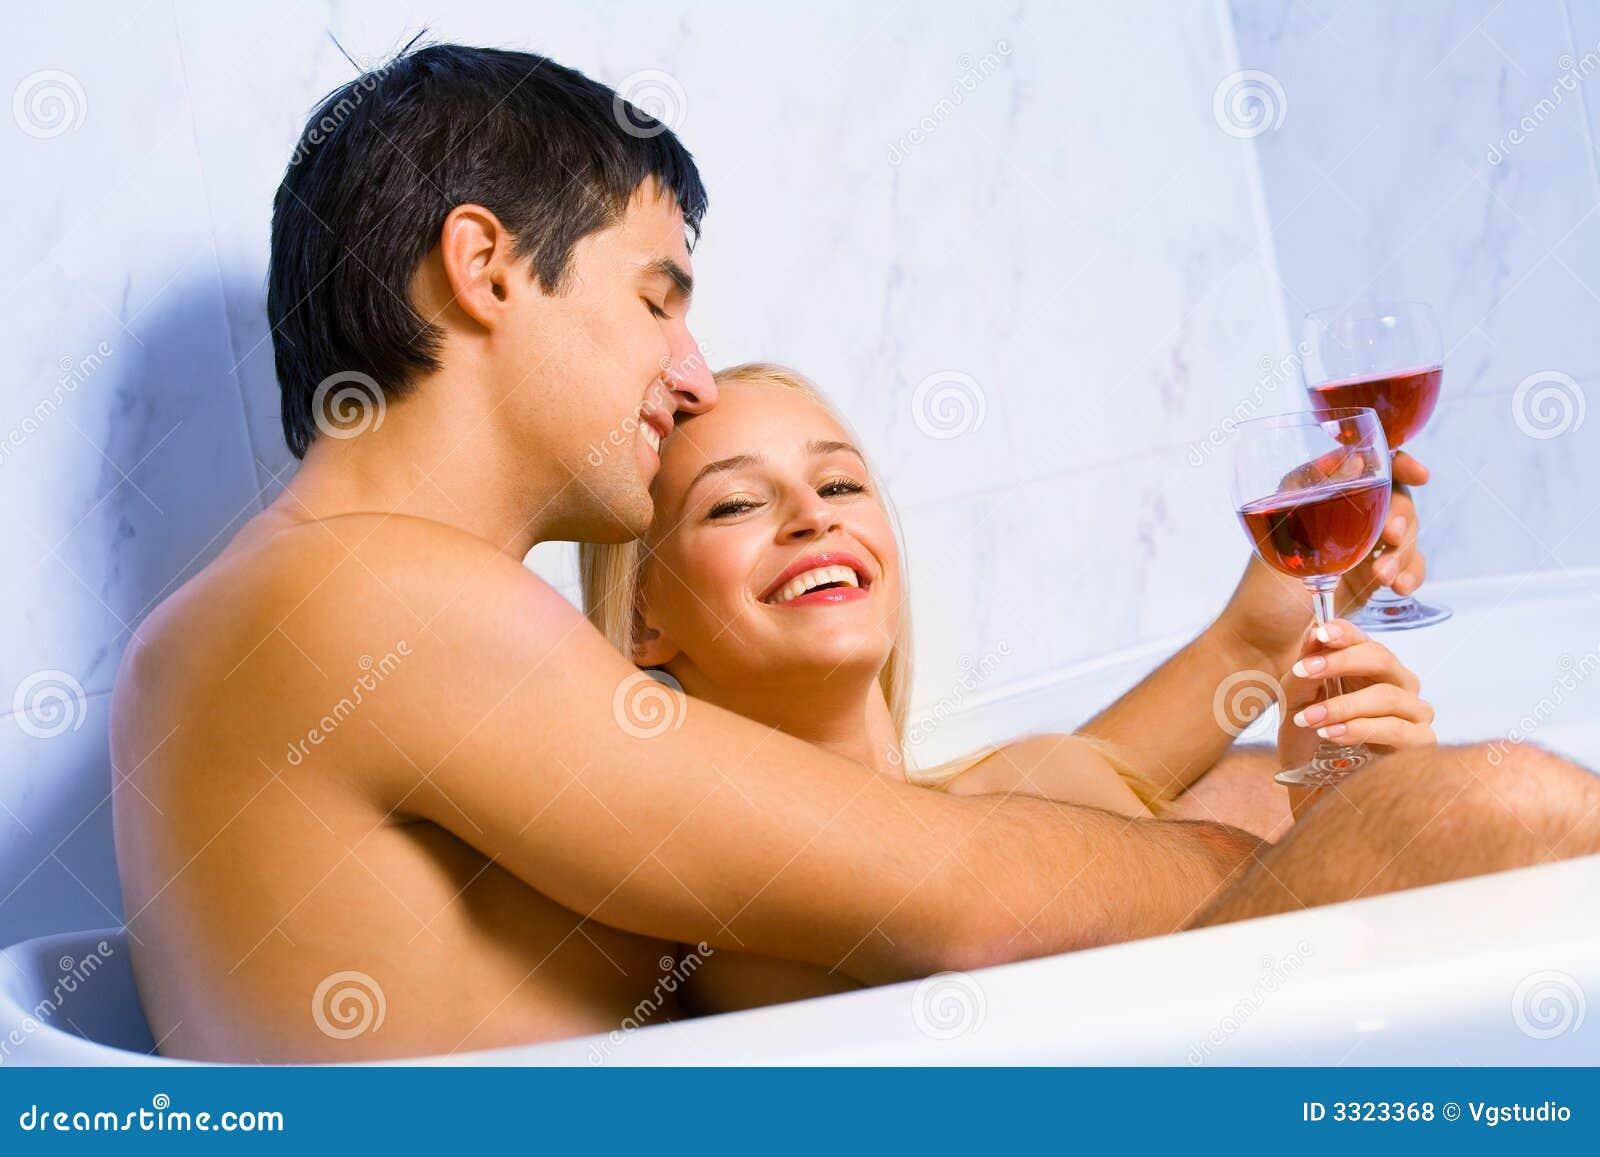 sensual massage relax sex on the beach drink